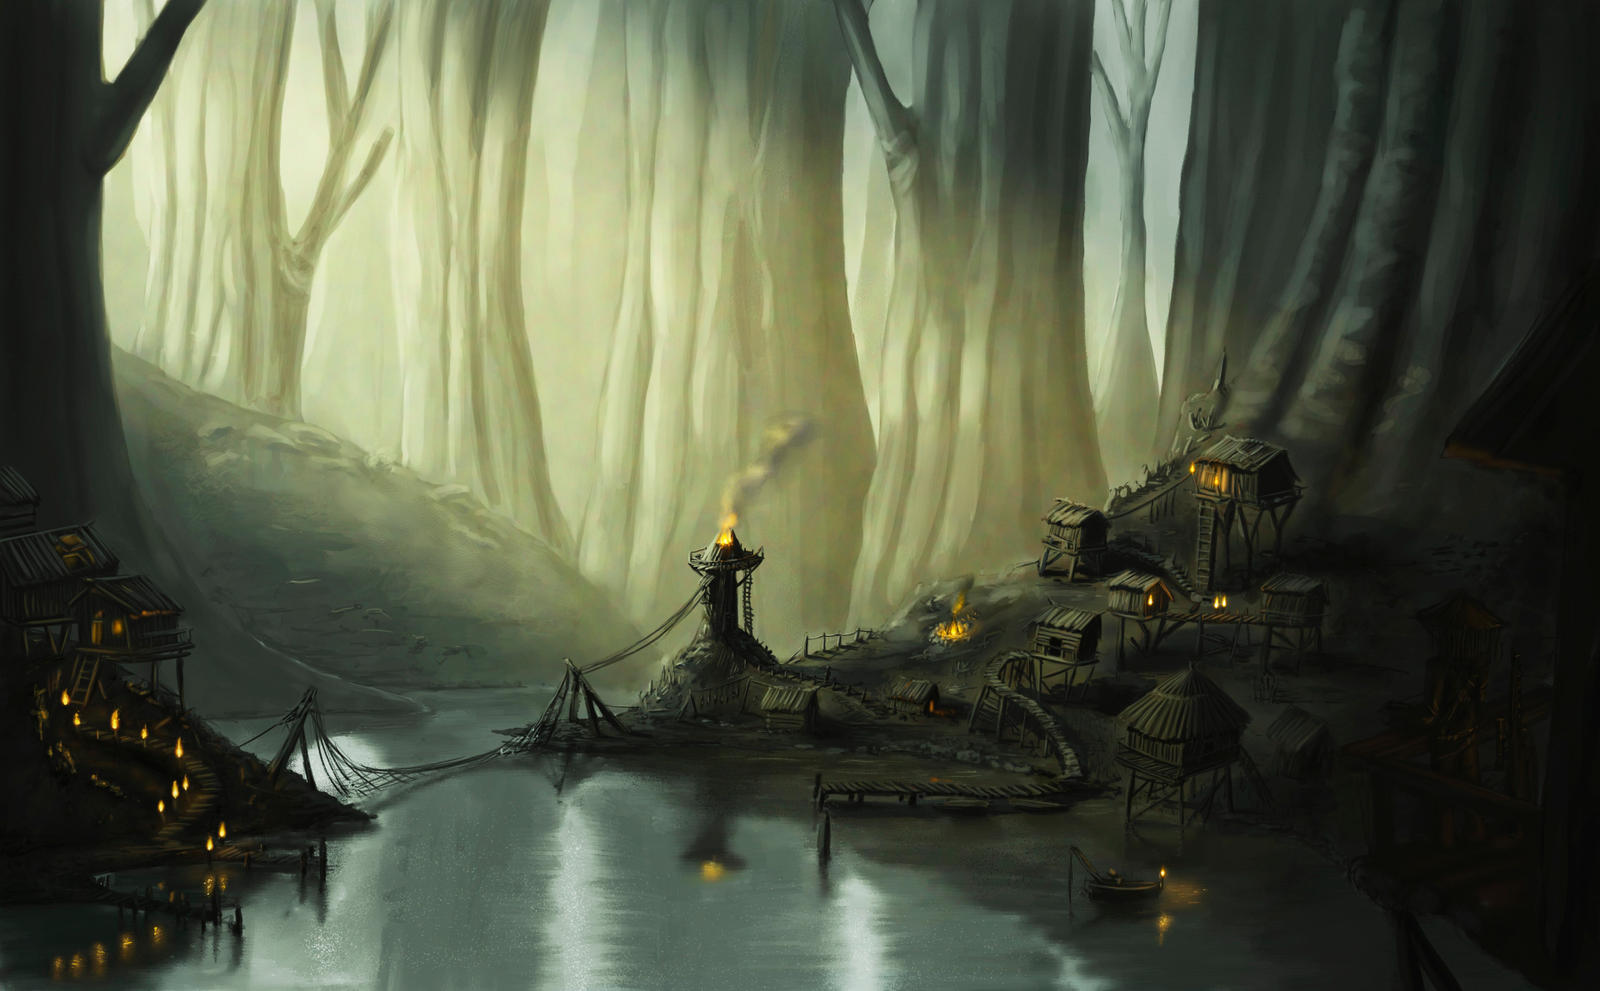 Village by LactroX